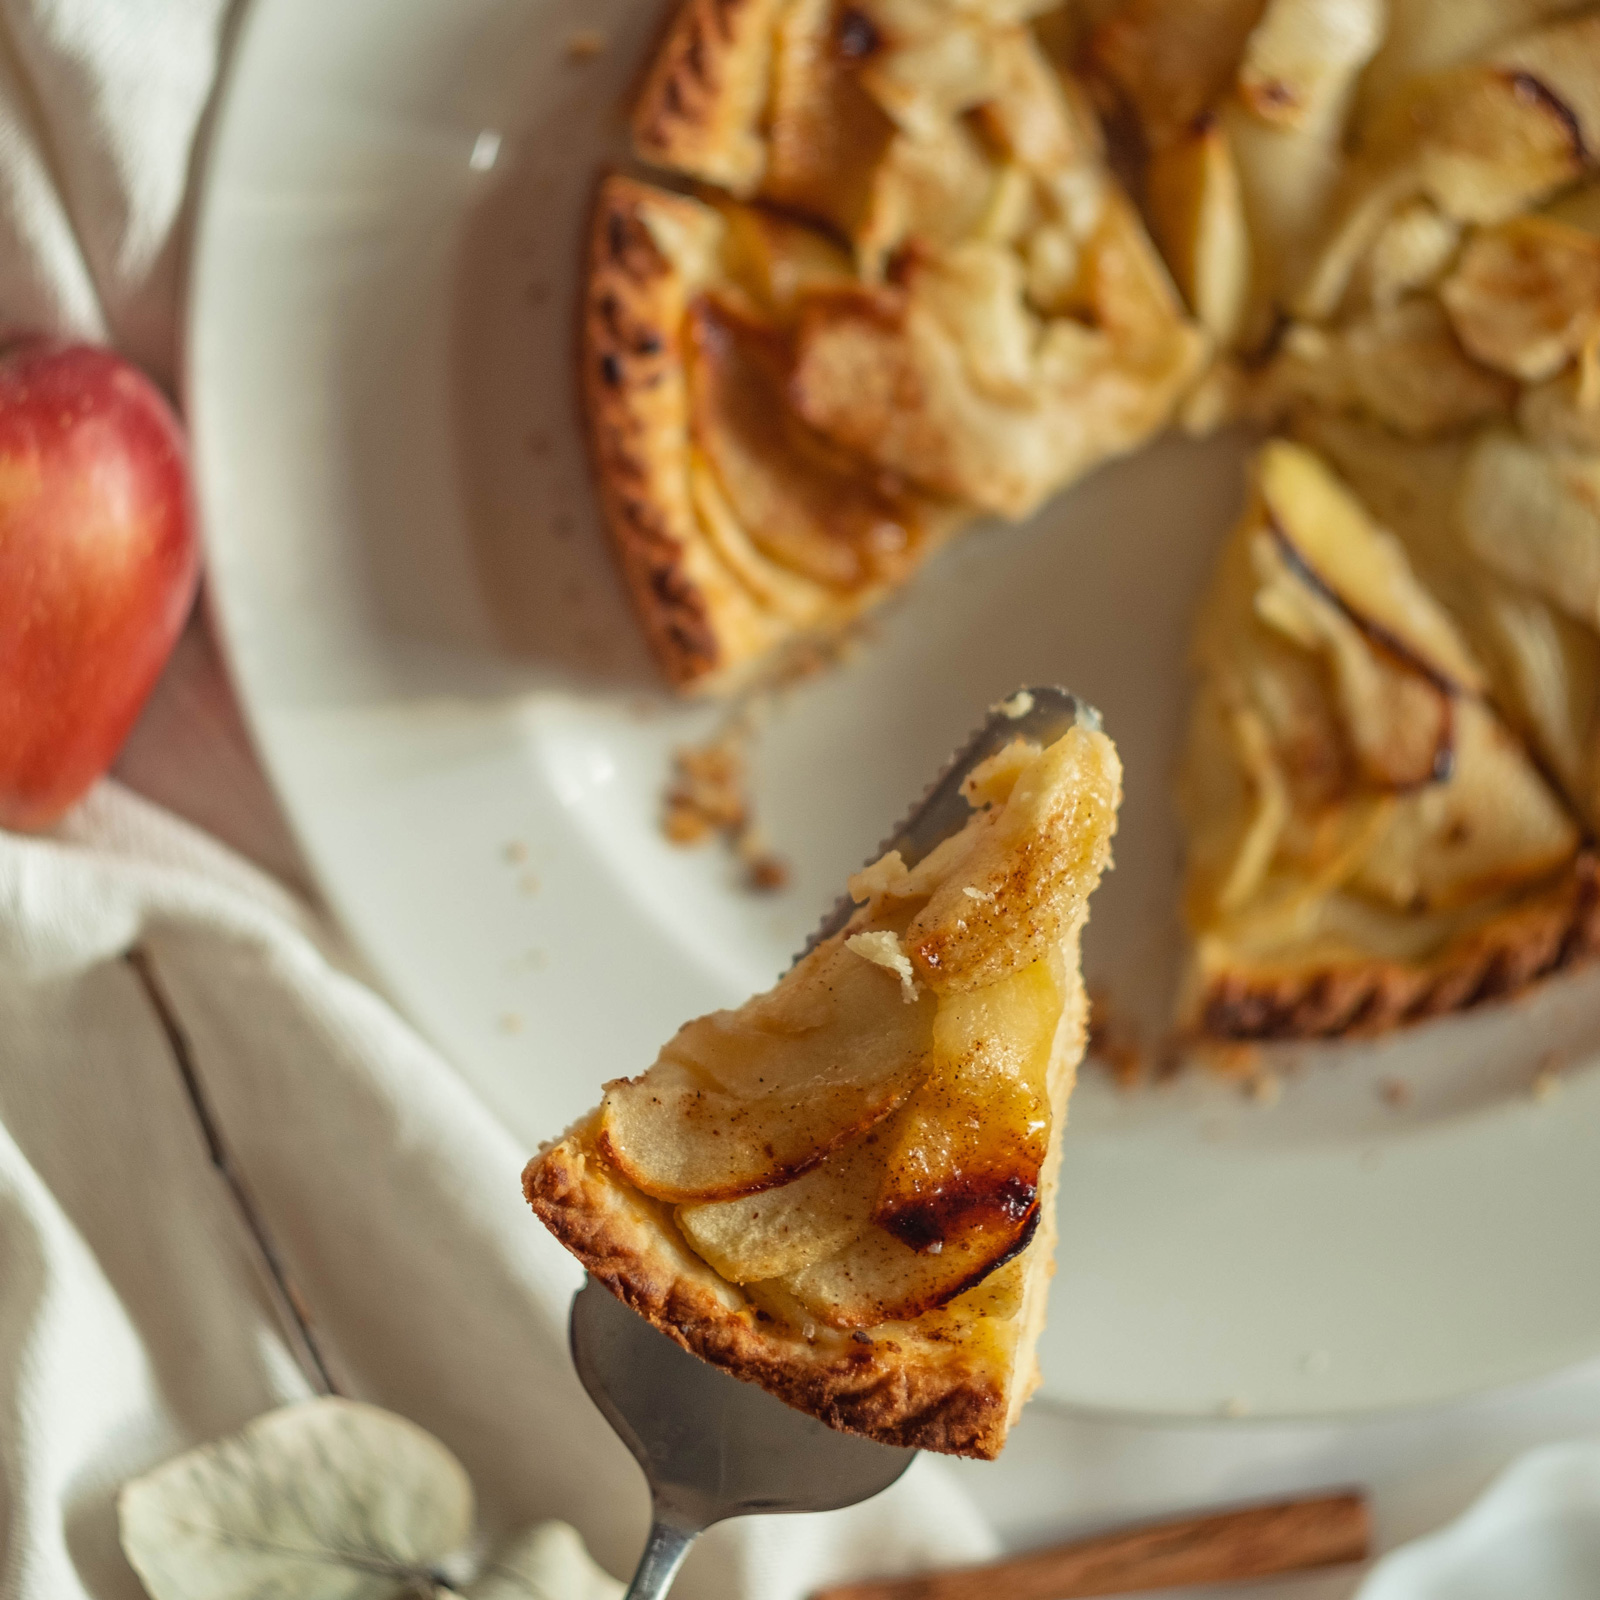 Doppelt gut: selbst gepflückt und selbst gebacken